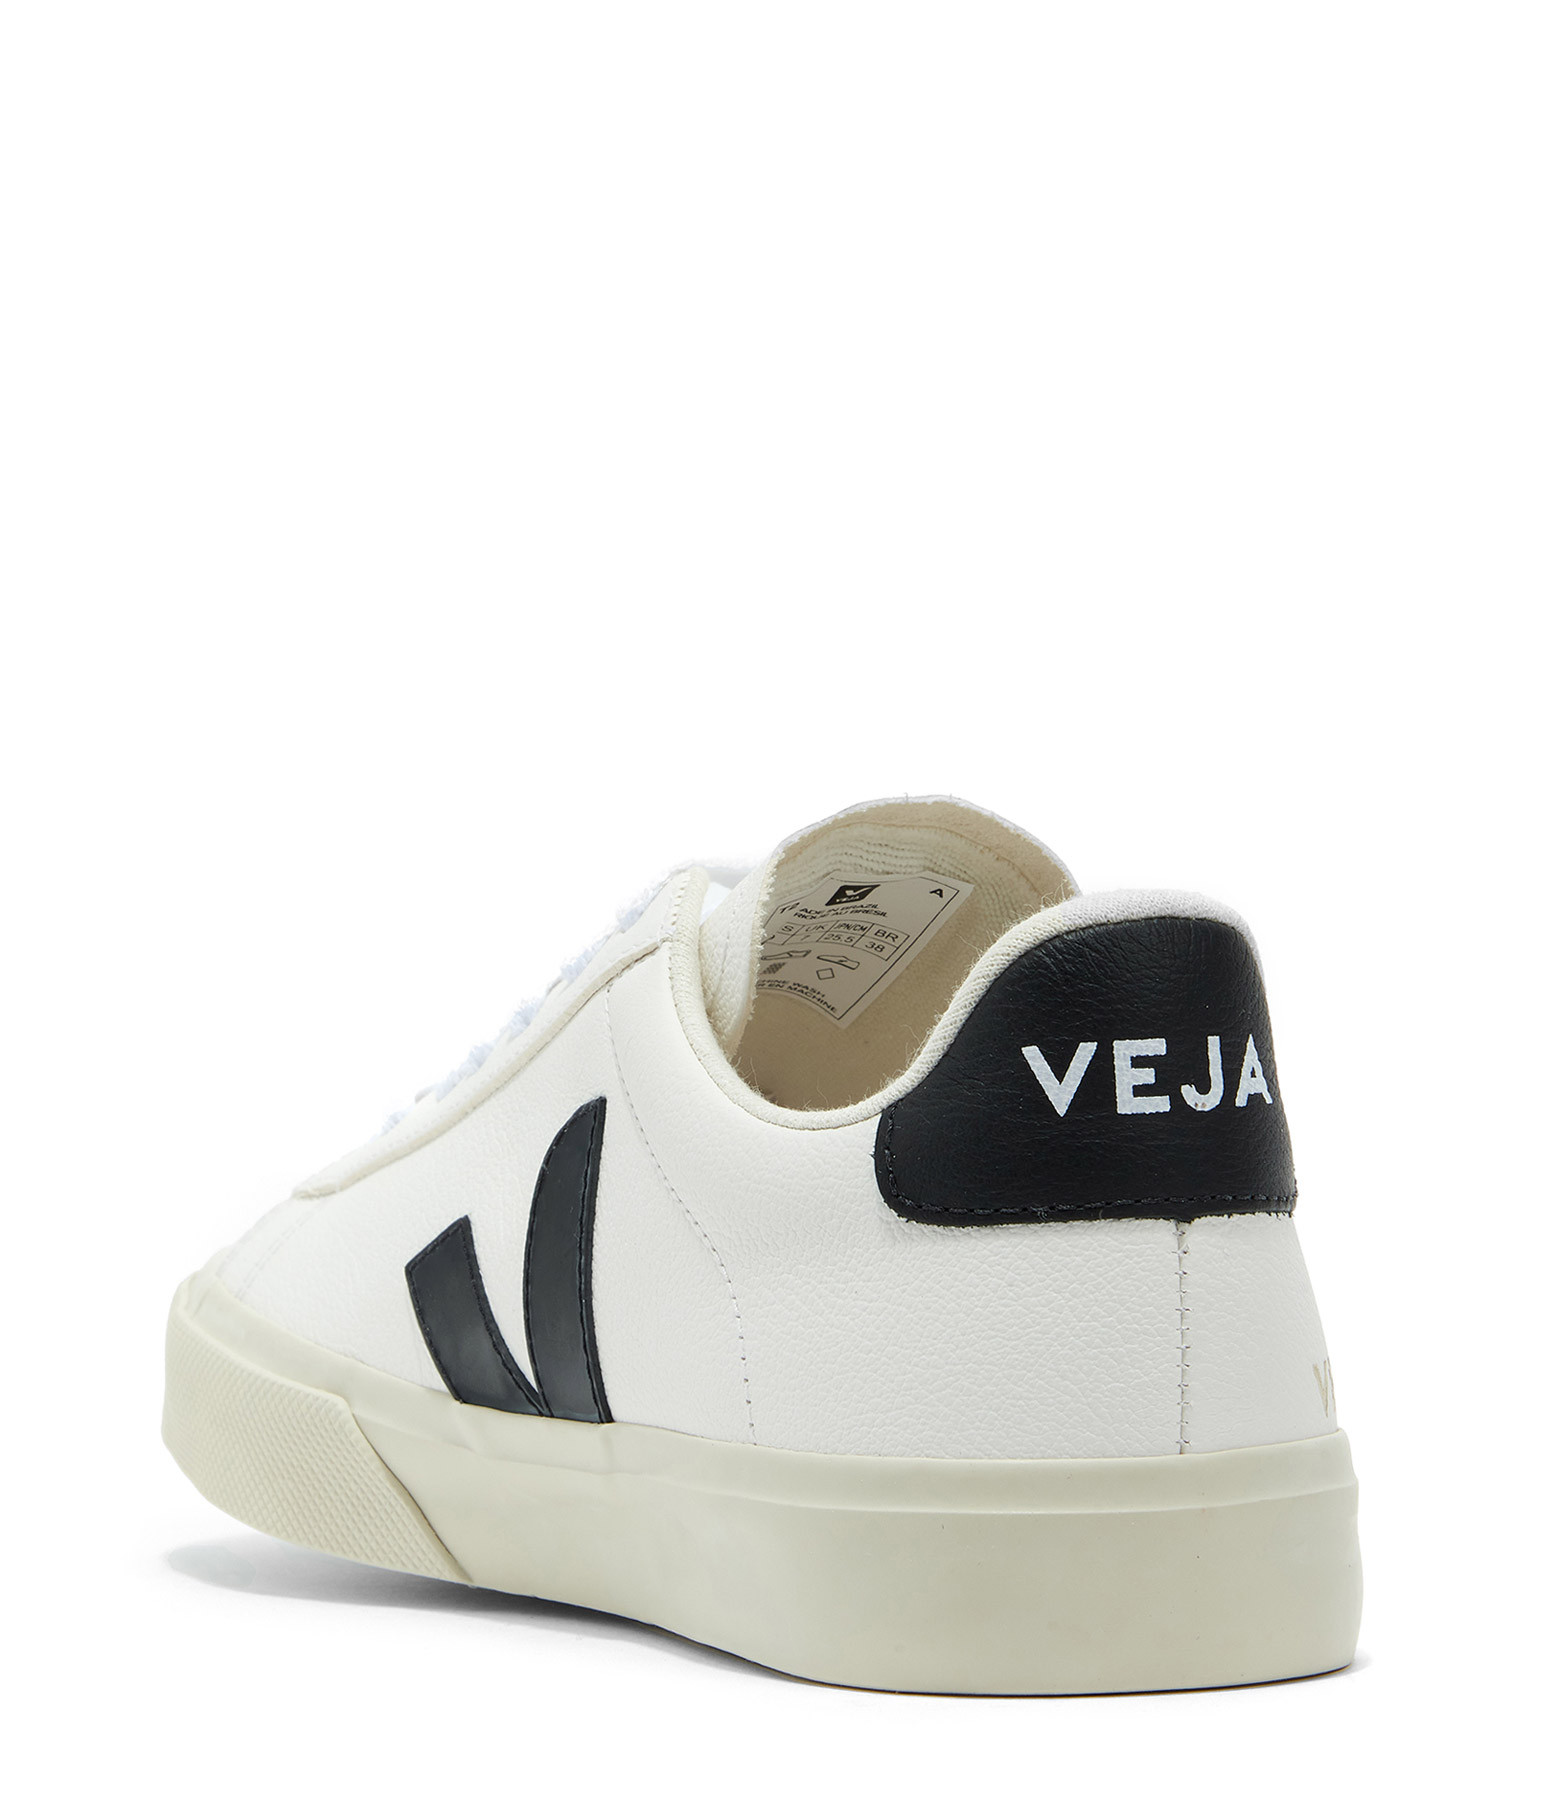 VEJA - Baskets Campo Chromefree Cuir Blanc Noir